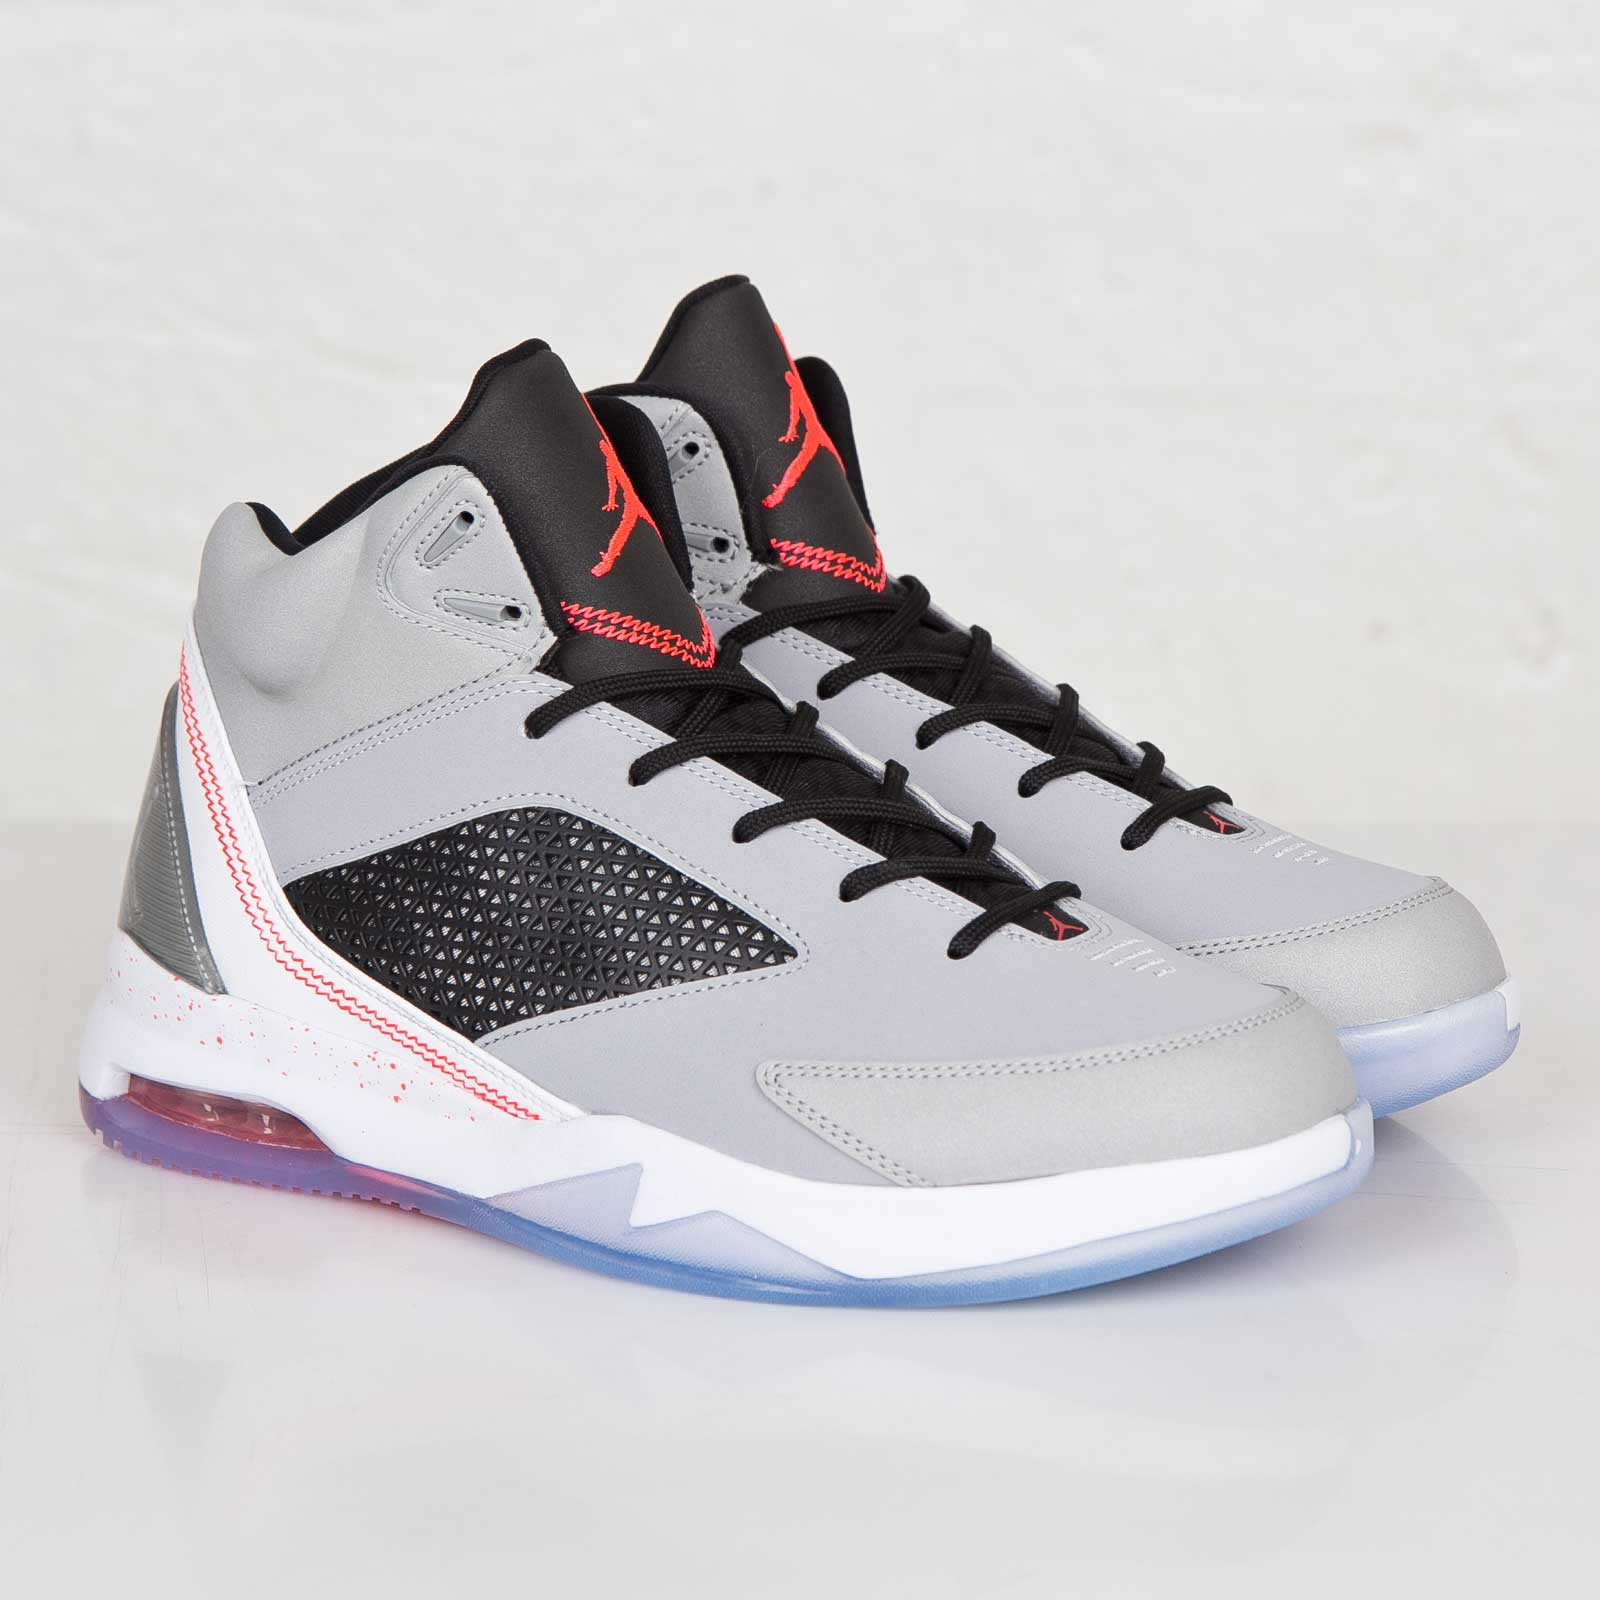 40ad8b9ea1ce Jordan Brand Air Jordan Flight Remix - 679680-060 - Sneakersnstuff ...